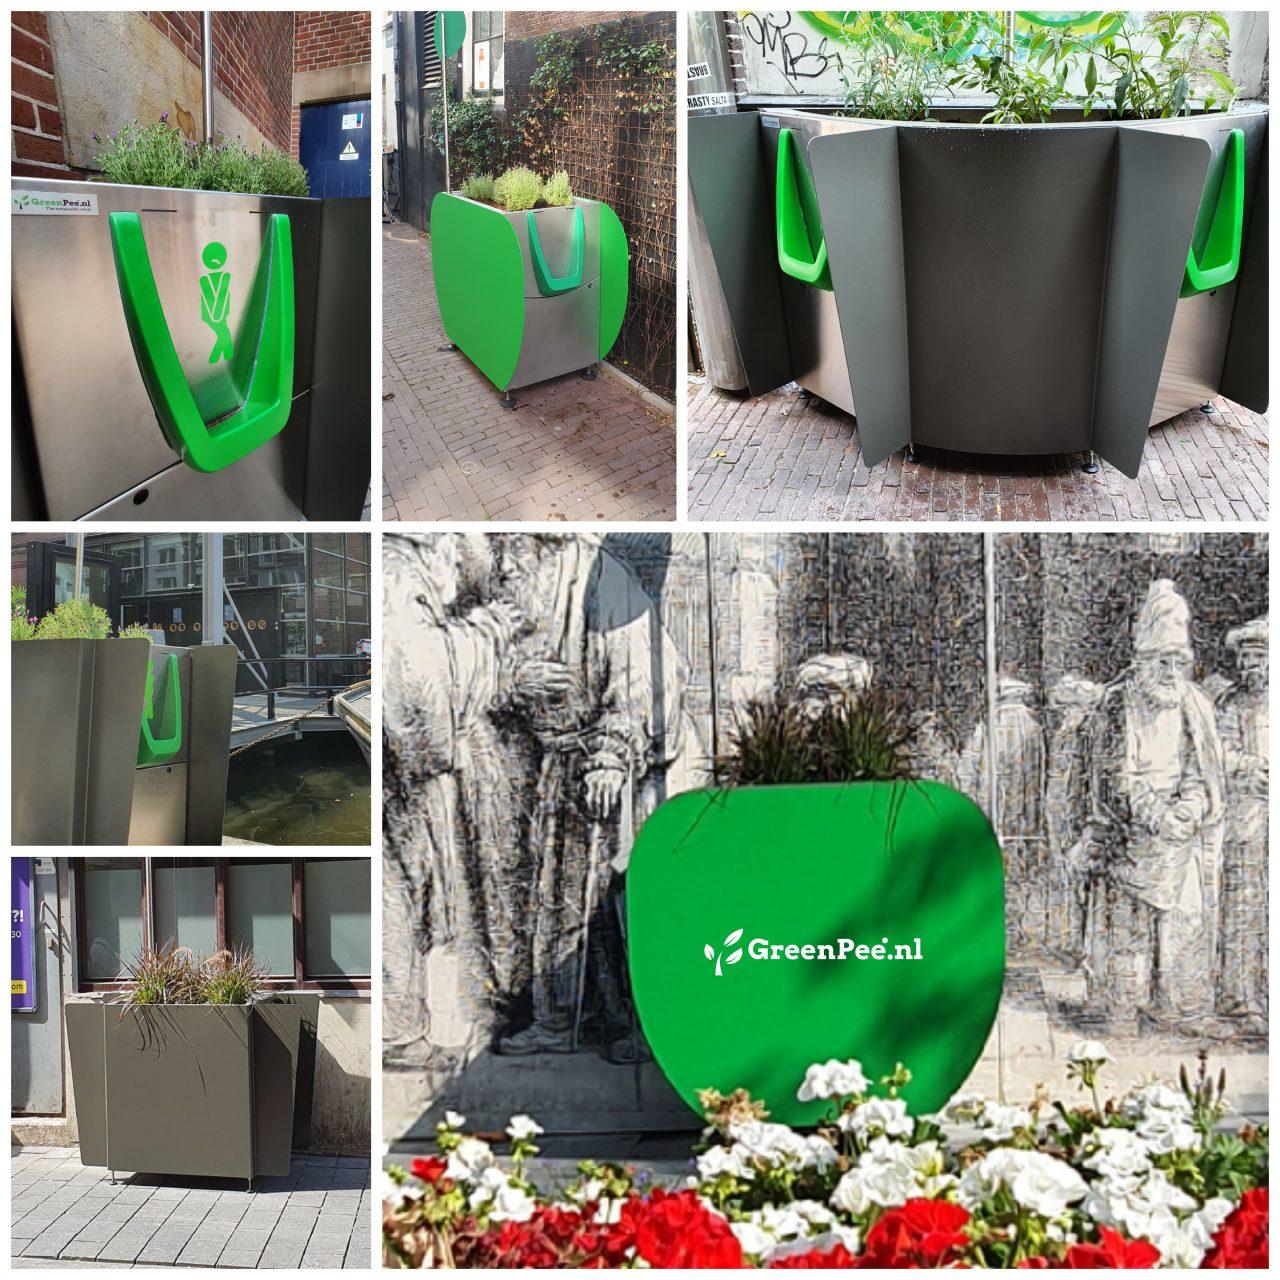 https://greenpee.nl/wp-content/uploads/2020/08/collage-GP-Amsterdam-1-1280x1280.jpg